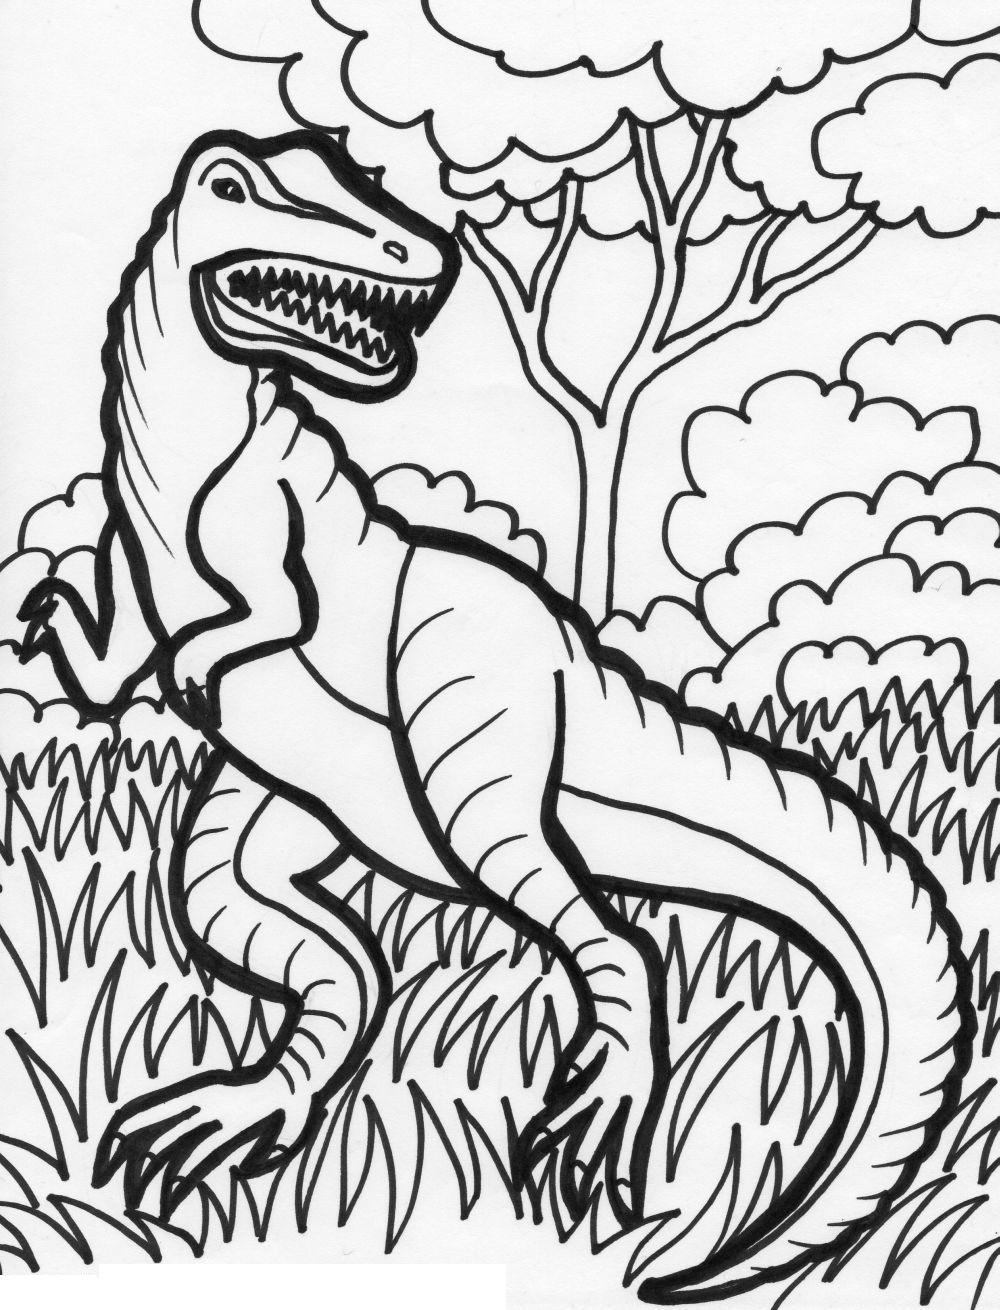 Dinosaur colouring book | http://www.rvspug.org | Pinterest